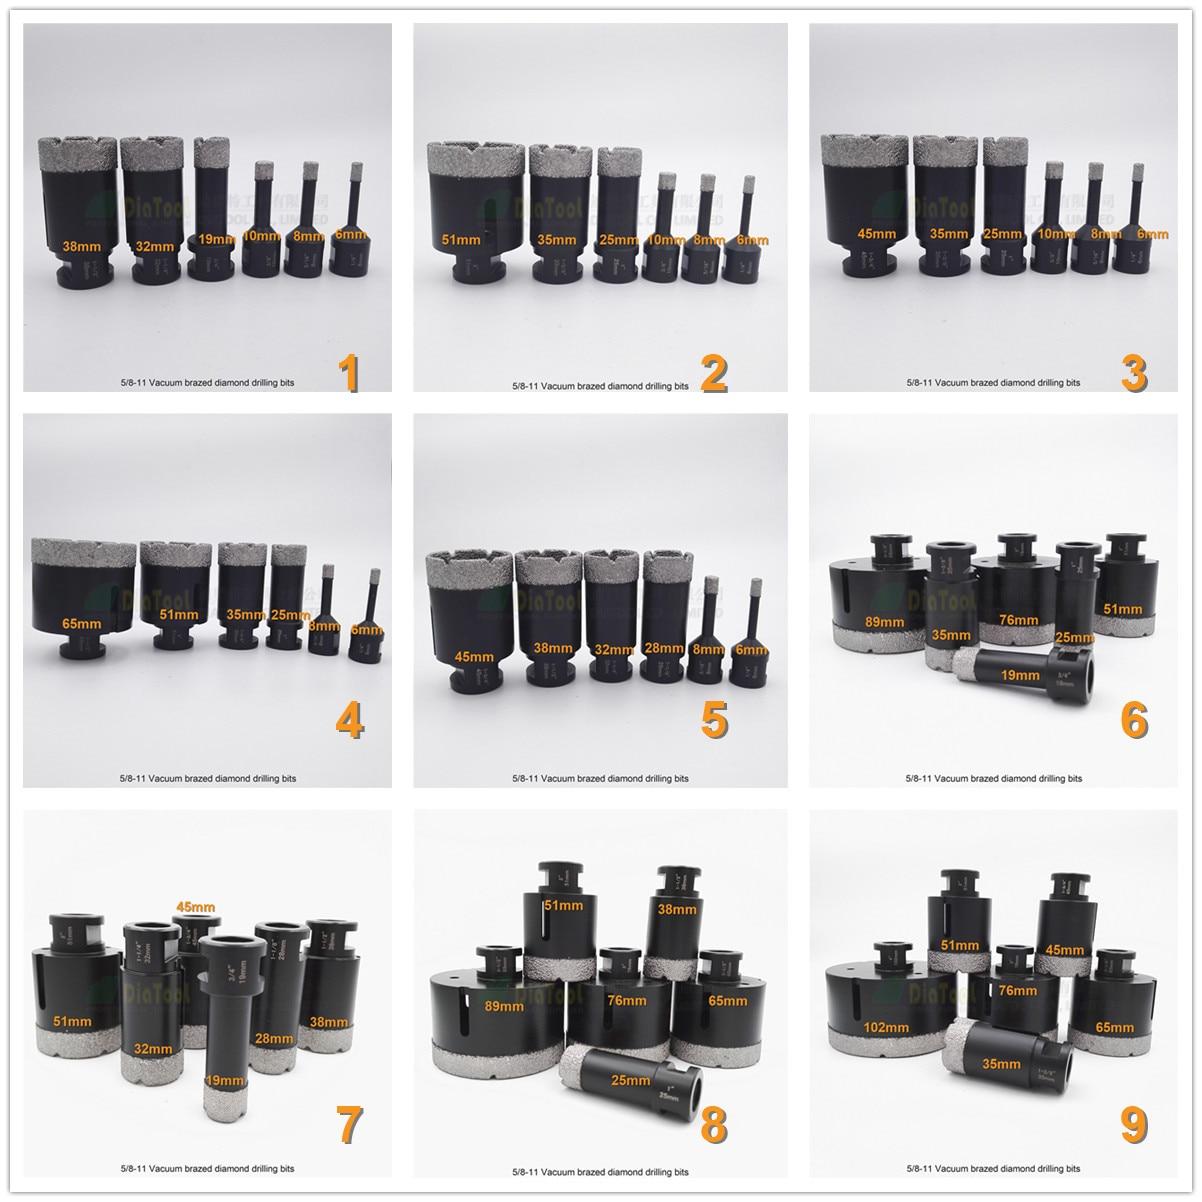 DIATOOL 6pcs/set Vacuum Brazed Diamond Dry Drilling Bits Dimeter 6mm+8mm+10mm+19mm+25mm+35mm 5/8-11 Connection diatool 2pcs 230mm vacuum brazed diamond